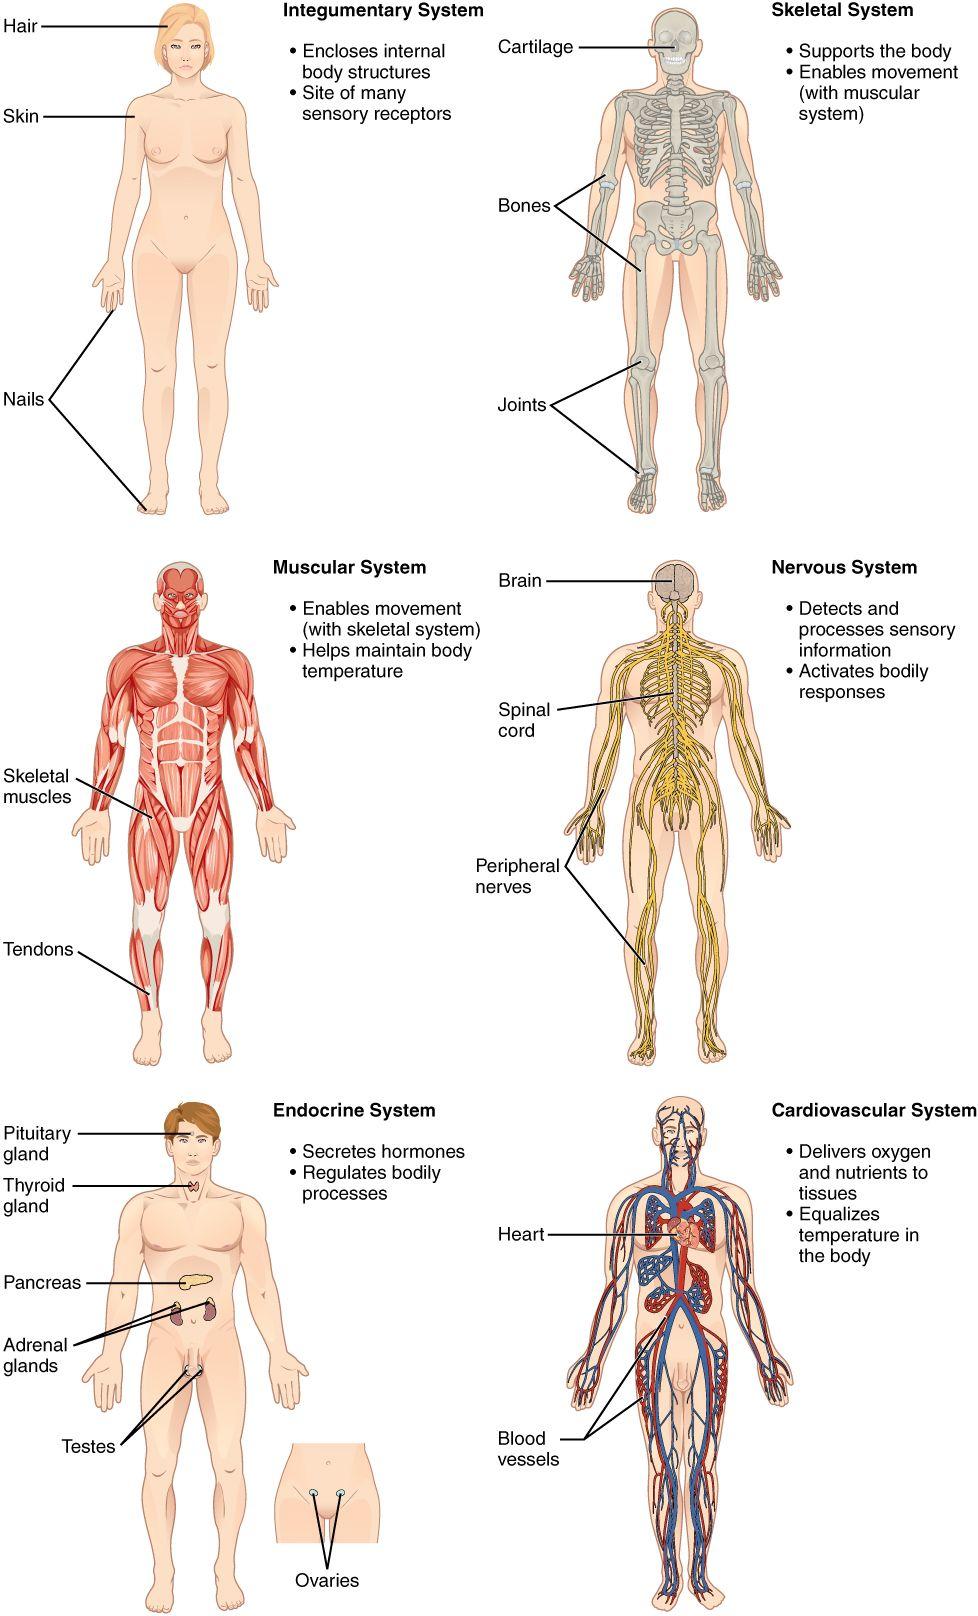 Human Anatomy Journals Choice Image Human Anatomy Learning Human Body Organs Human Body Anatomy Human Integumentary System